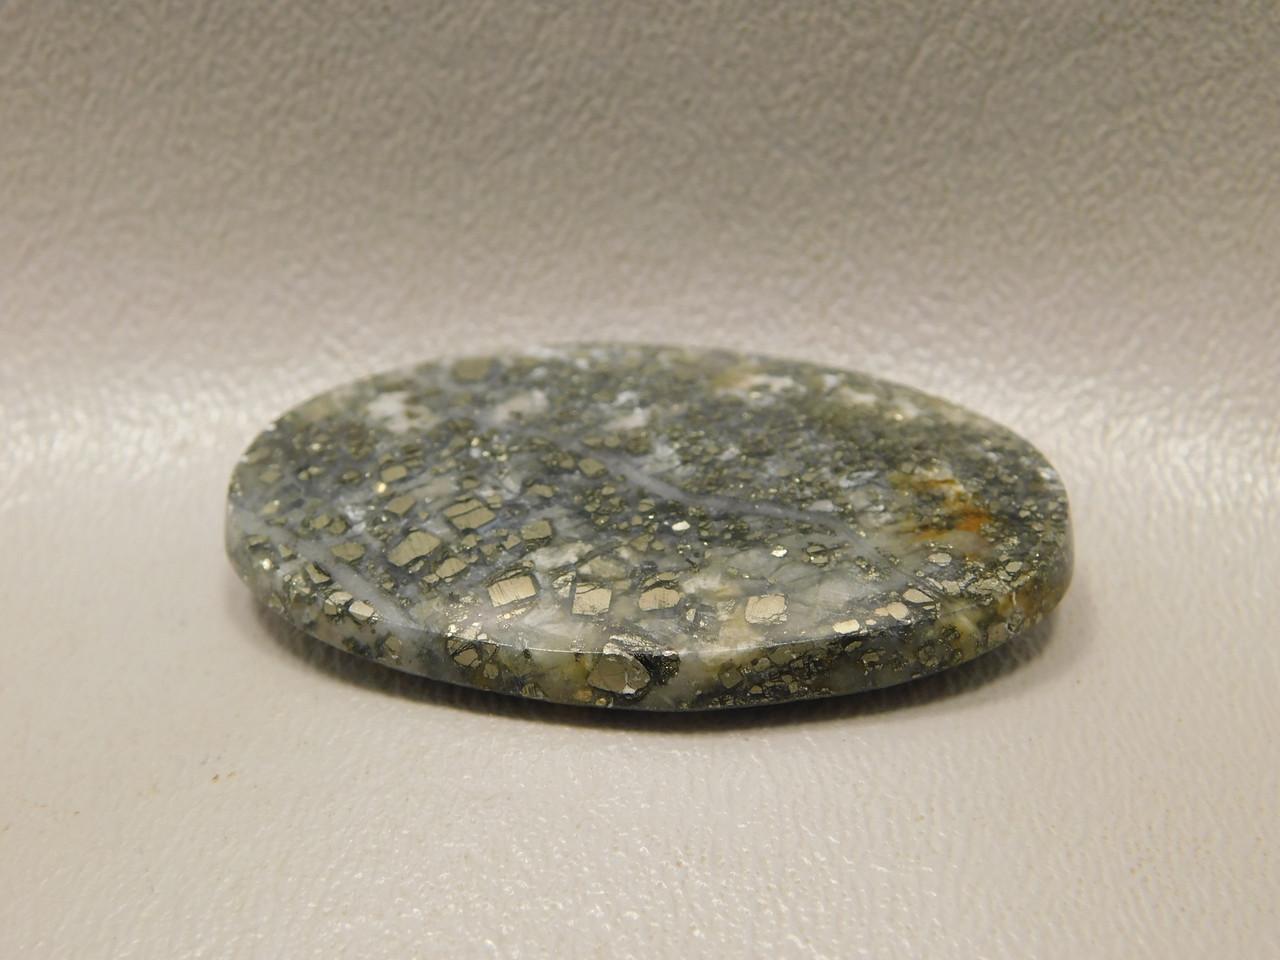 Stone Cabochon Gold Pyrite Agate Semi Precious Gemstone #20